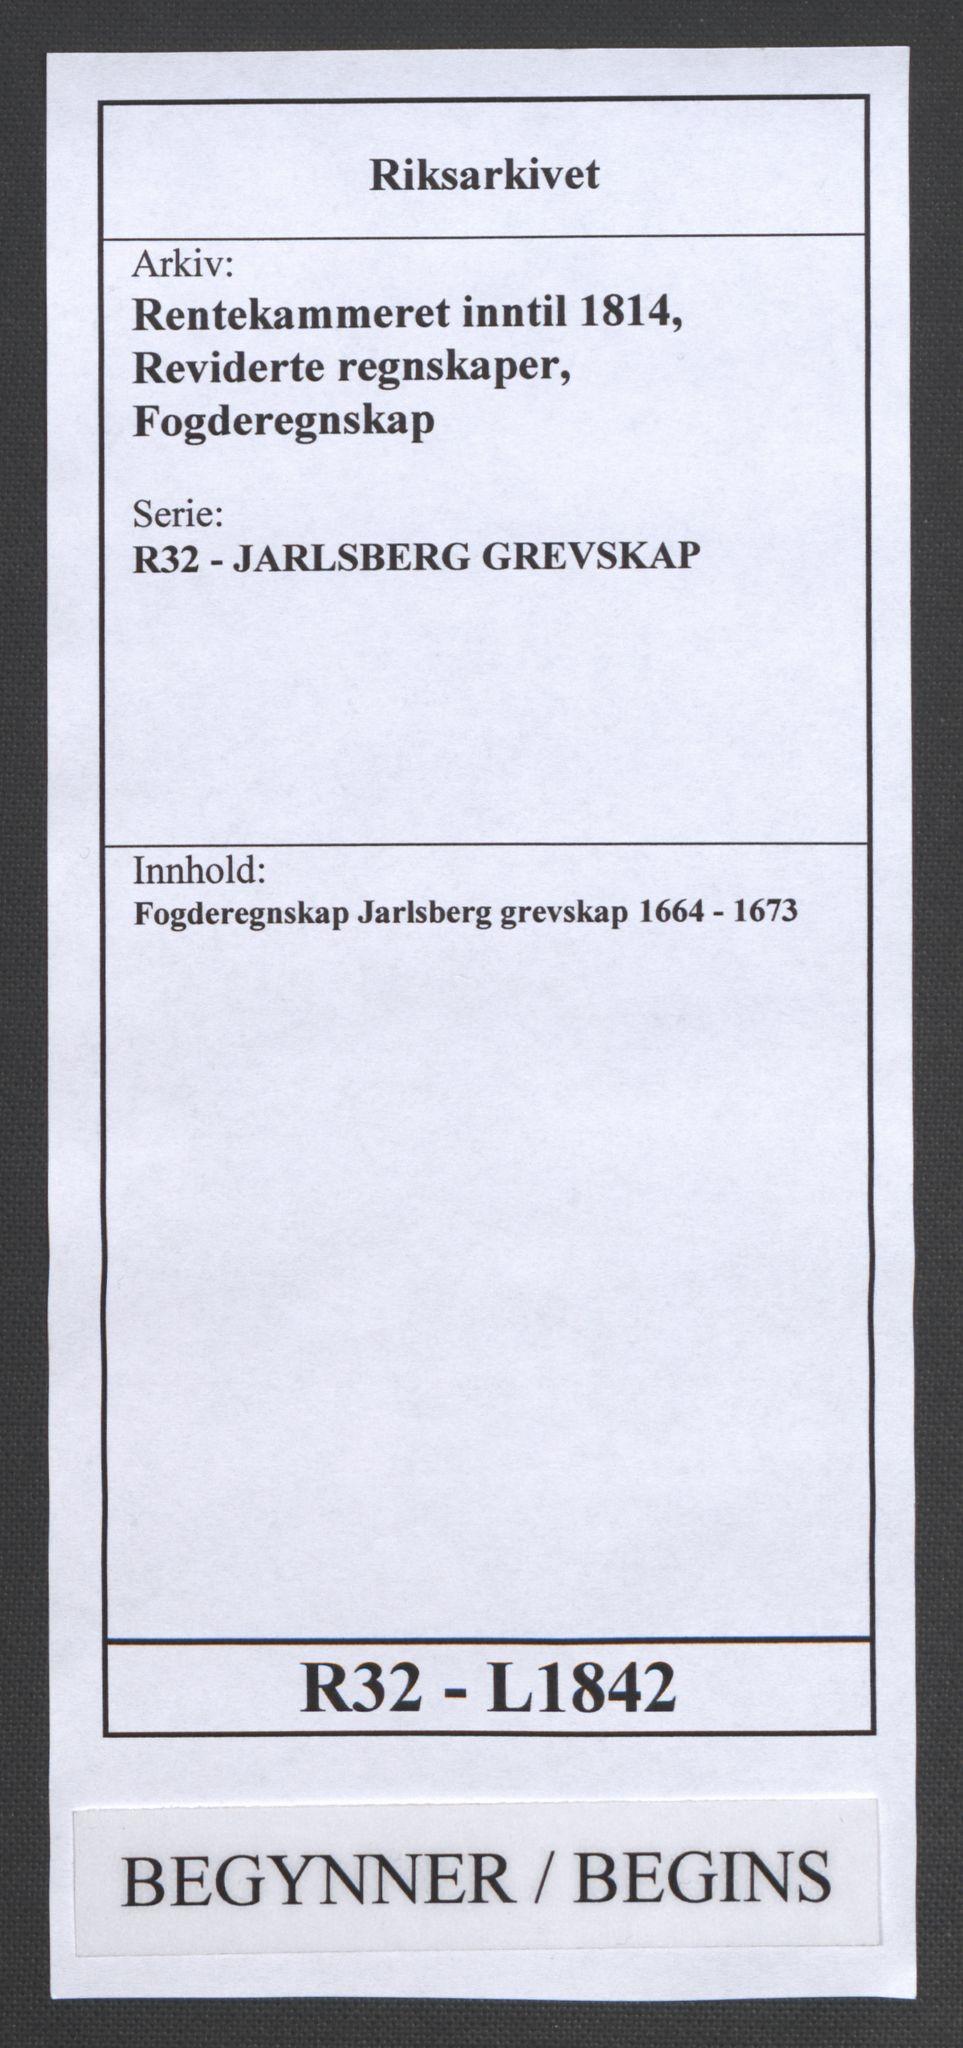 RA, Rentekammeret inntil 1814, Reviderte regnskaper, Fogderegnskap, R32/L1842: Fogderegnskap Jarlsberg grevskap, 1664-1673, s. 1